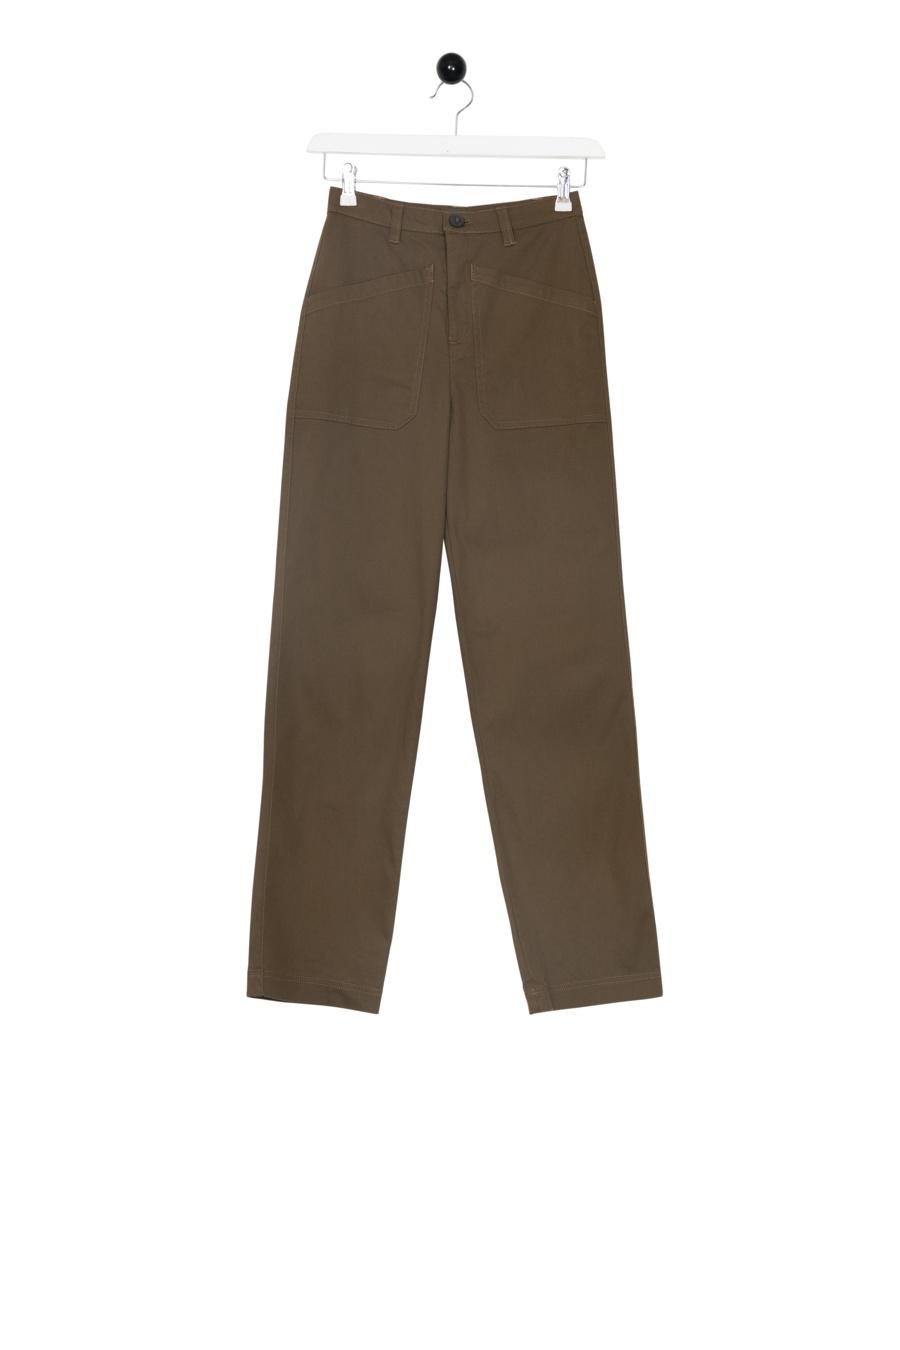 Return Nest Point Trousers